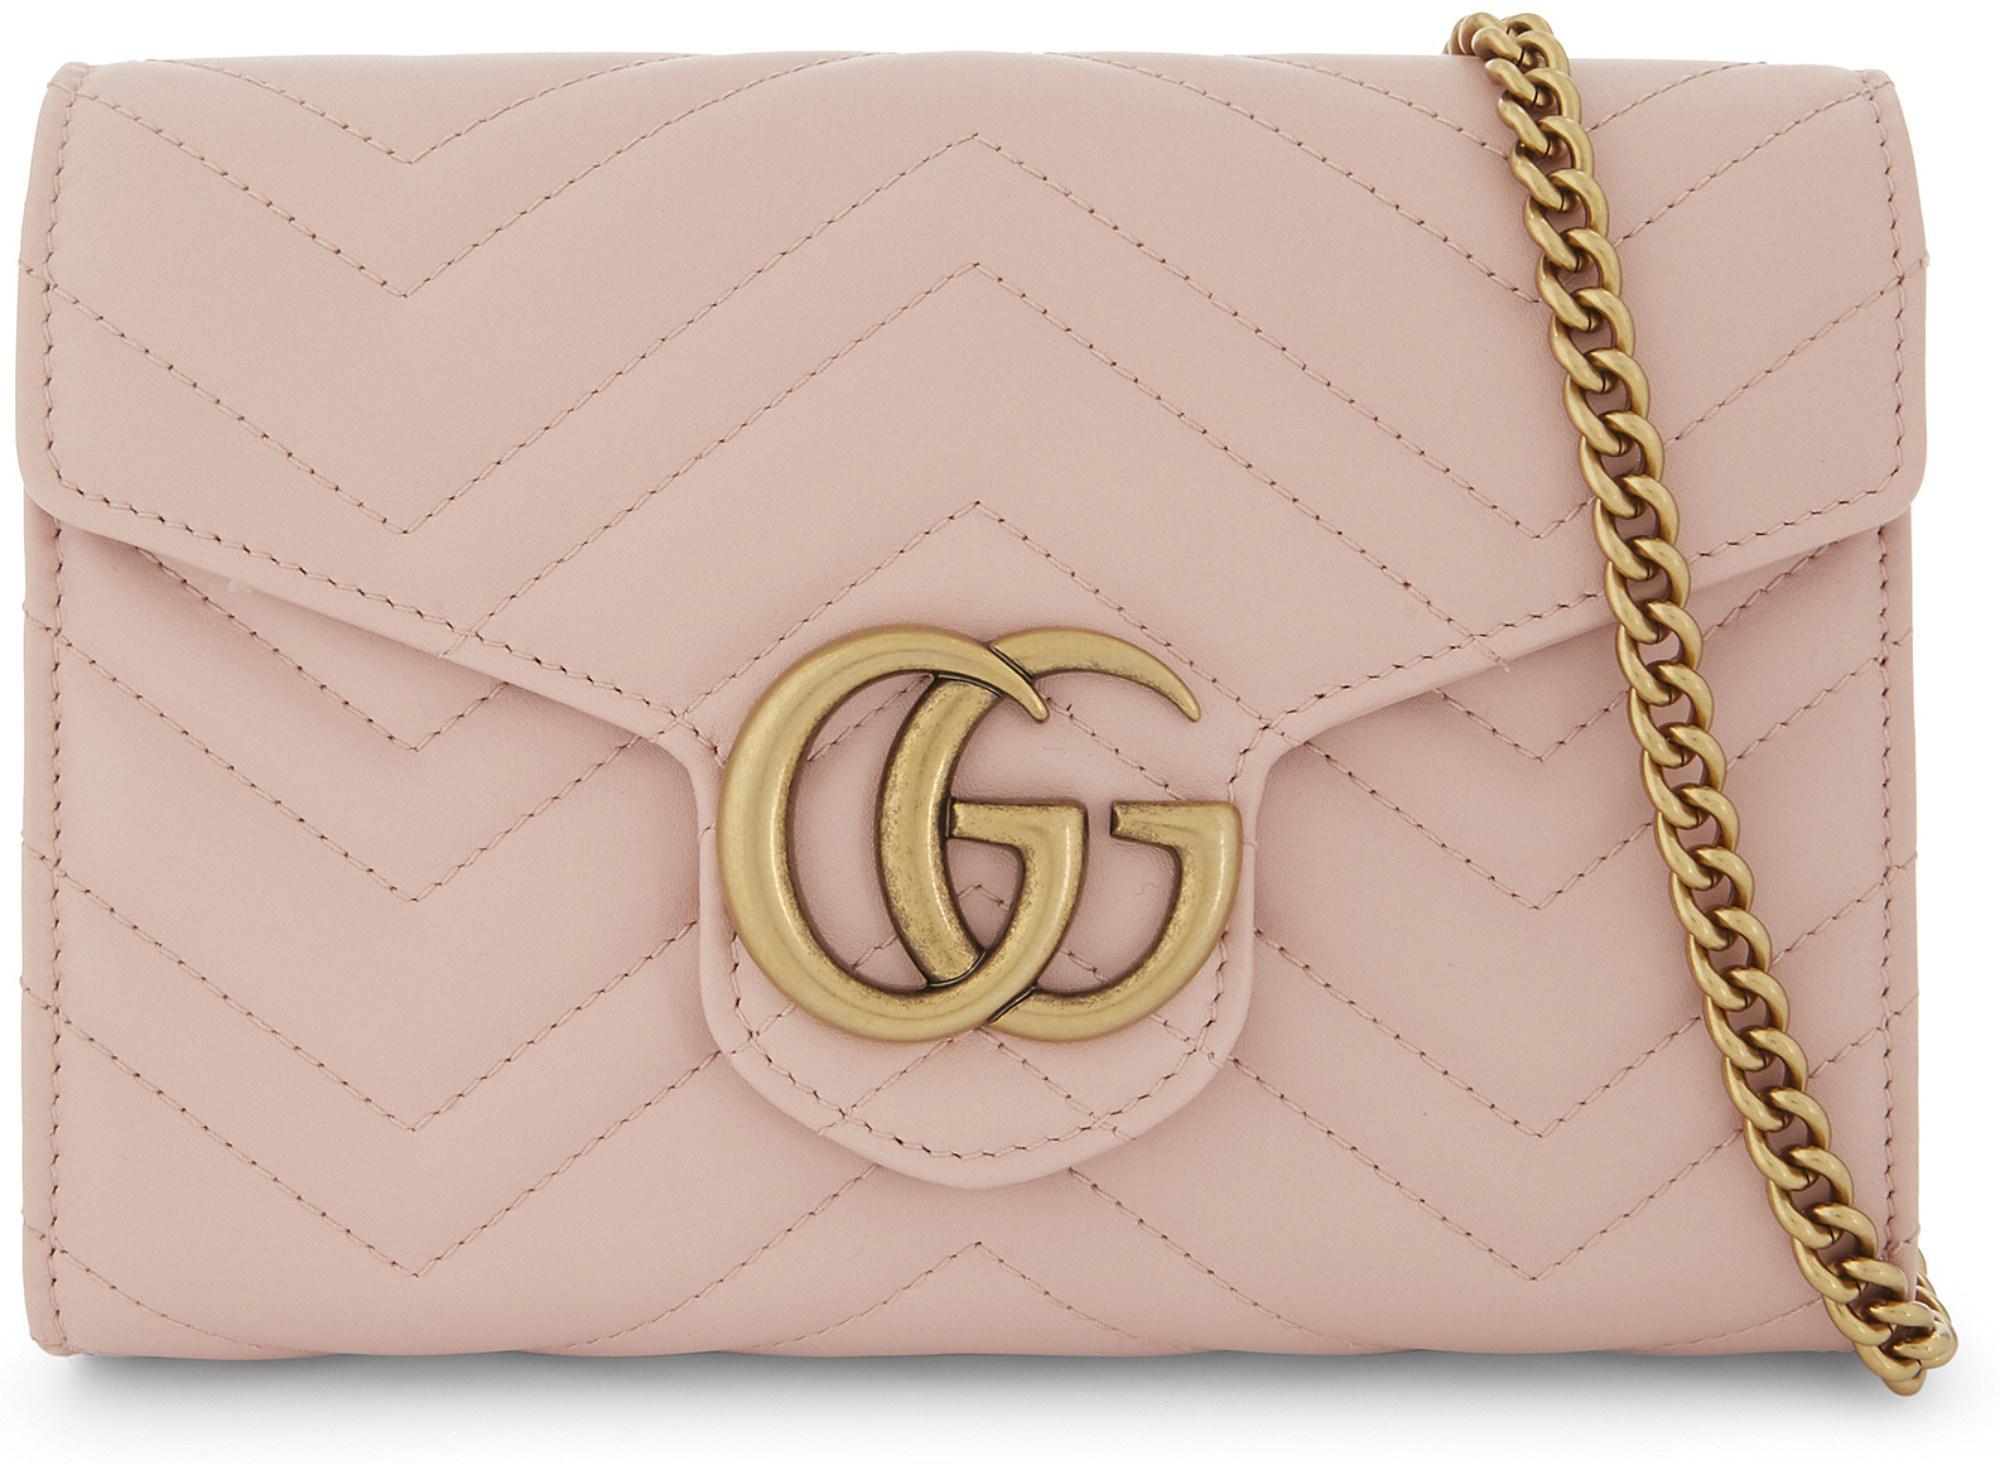 e501b5be0e84 Lyst - Gucci Gg Marmont Matelassé Mini Bag in Pink